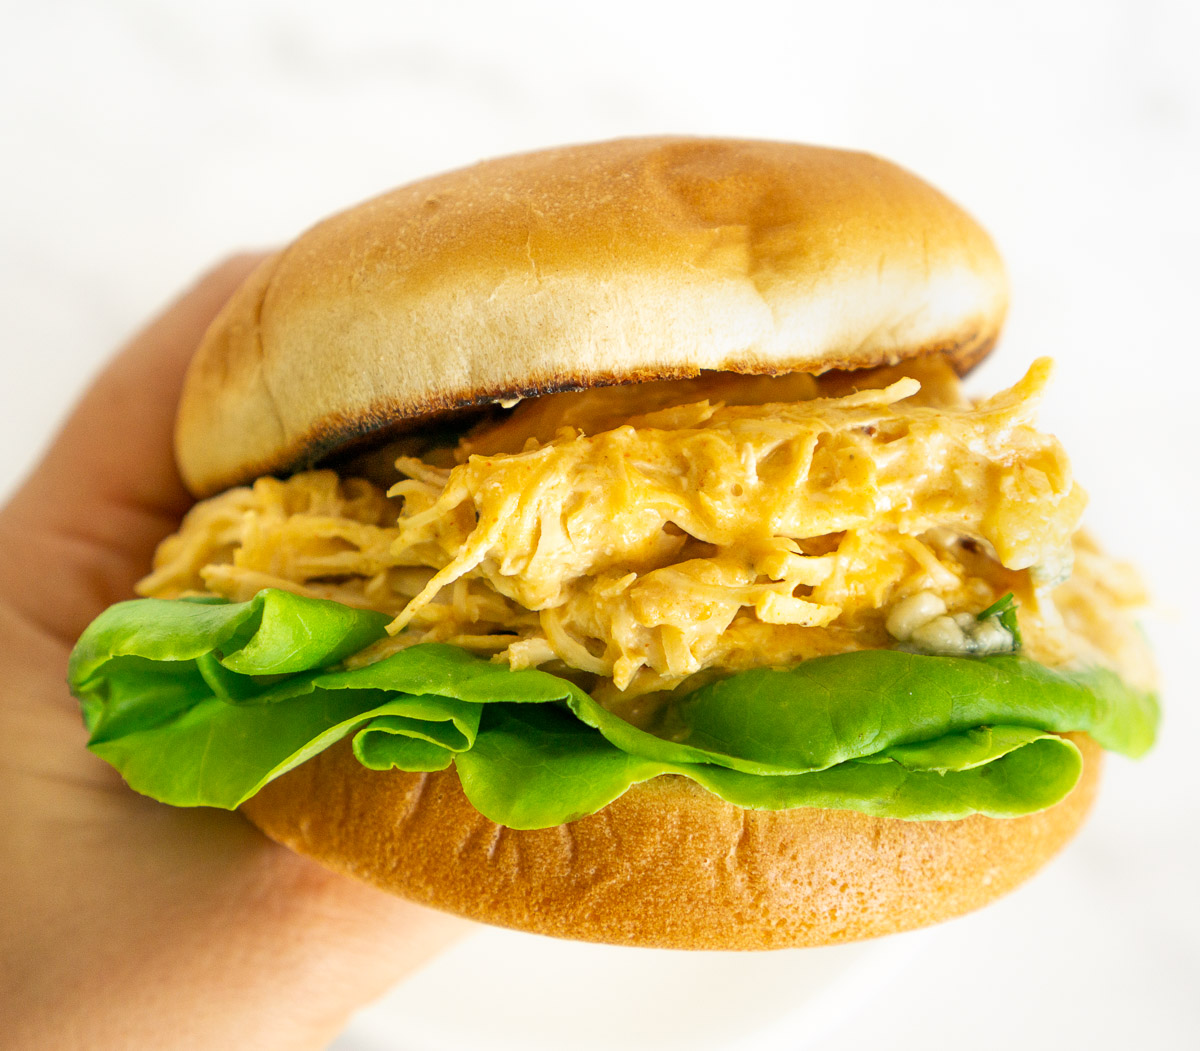 hand holding shredded Buffalo chicken sandwich with lettuce